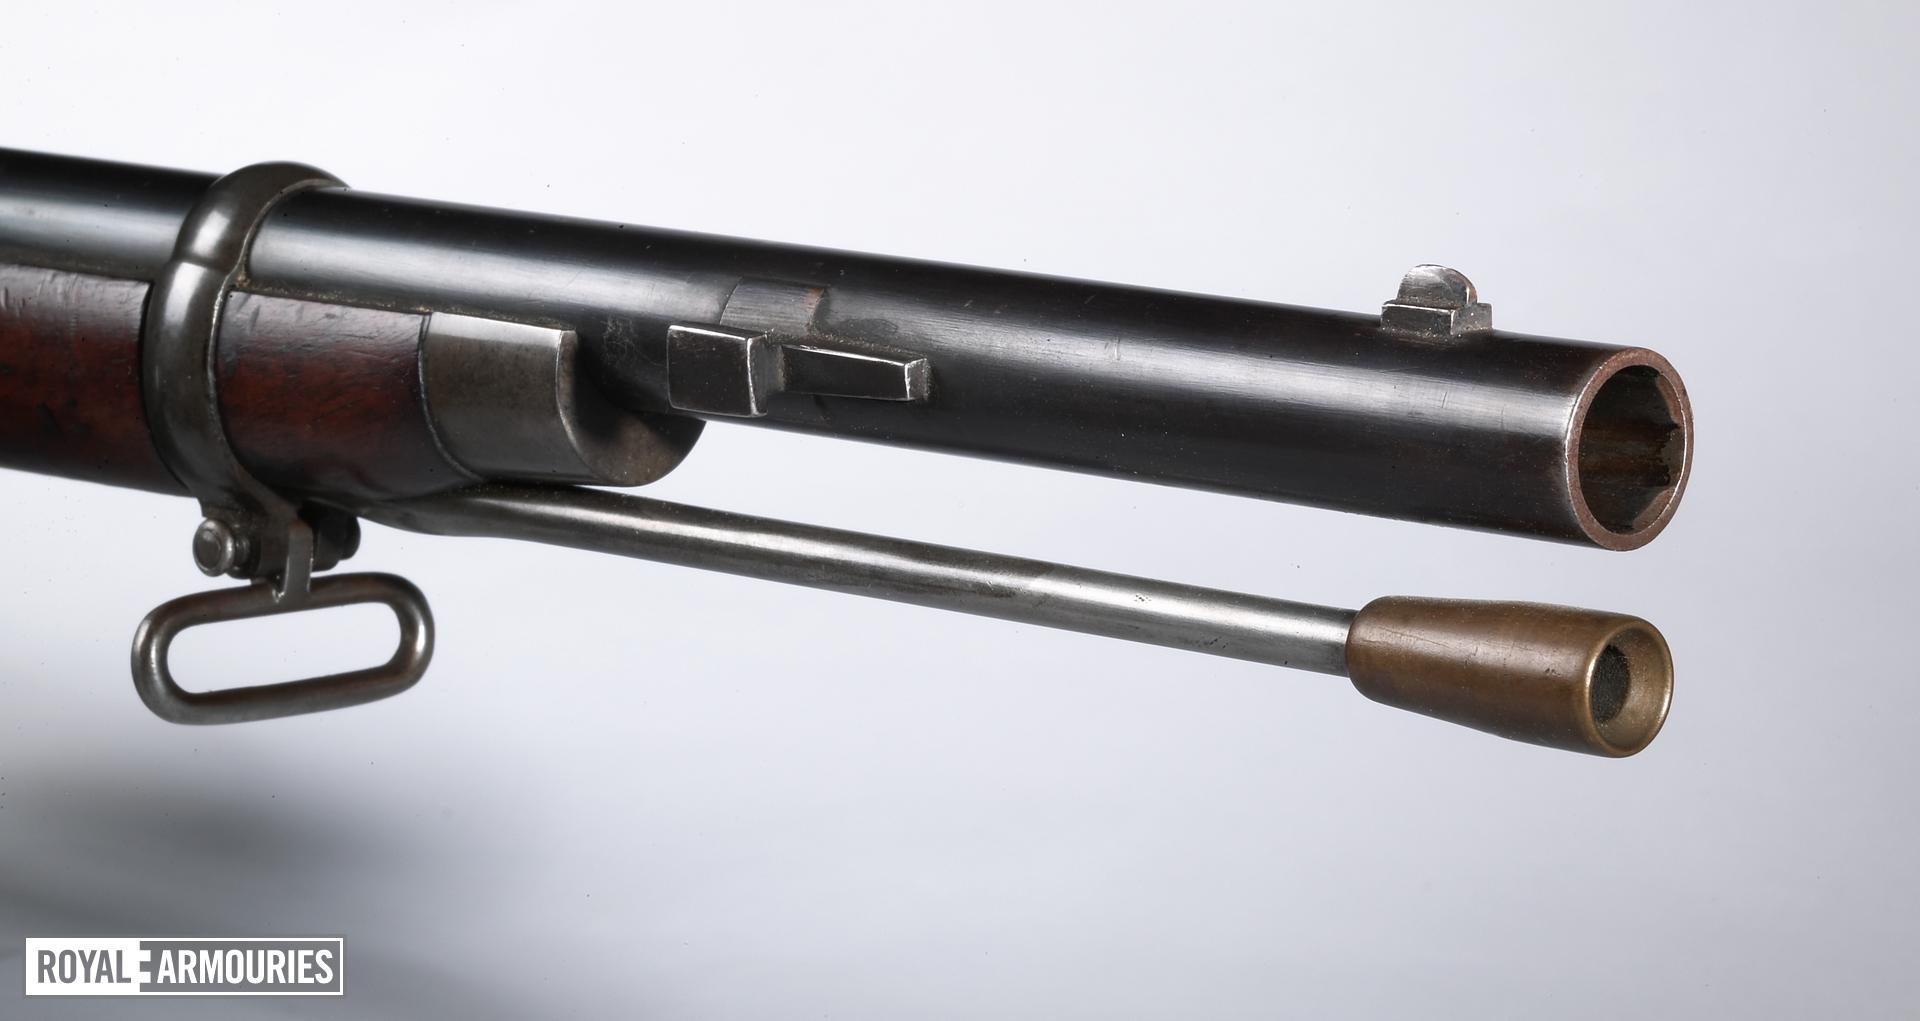 Percussion muzzle-loading military rifle - Jacob Pattern 1853